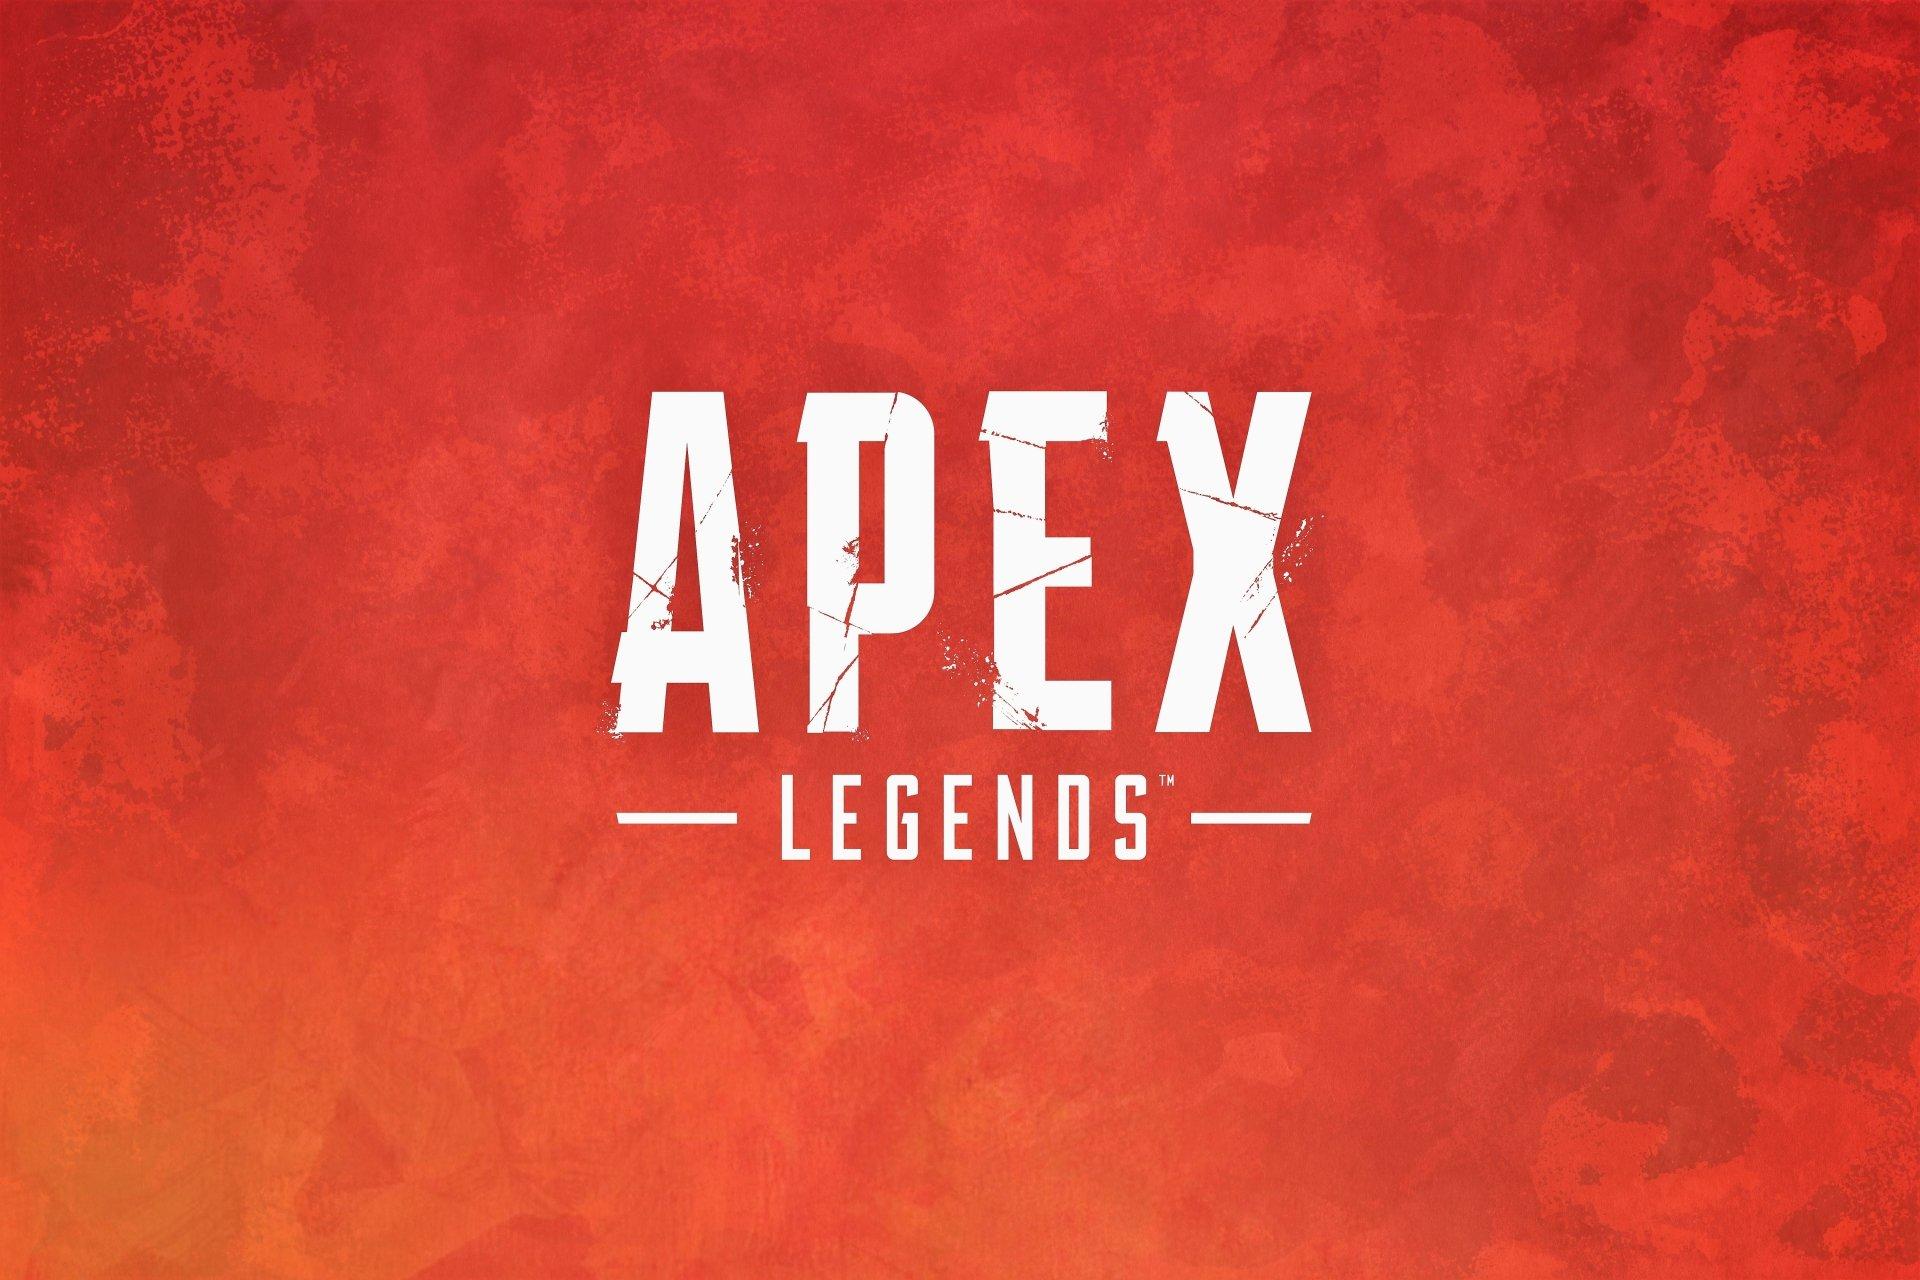 Apex Legends Game Wallpaper HD 4k